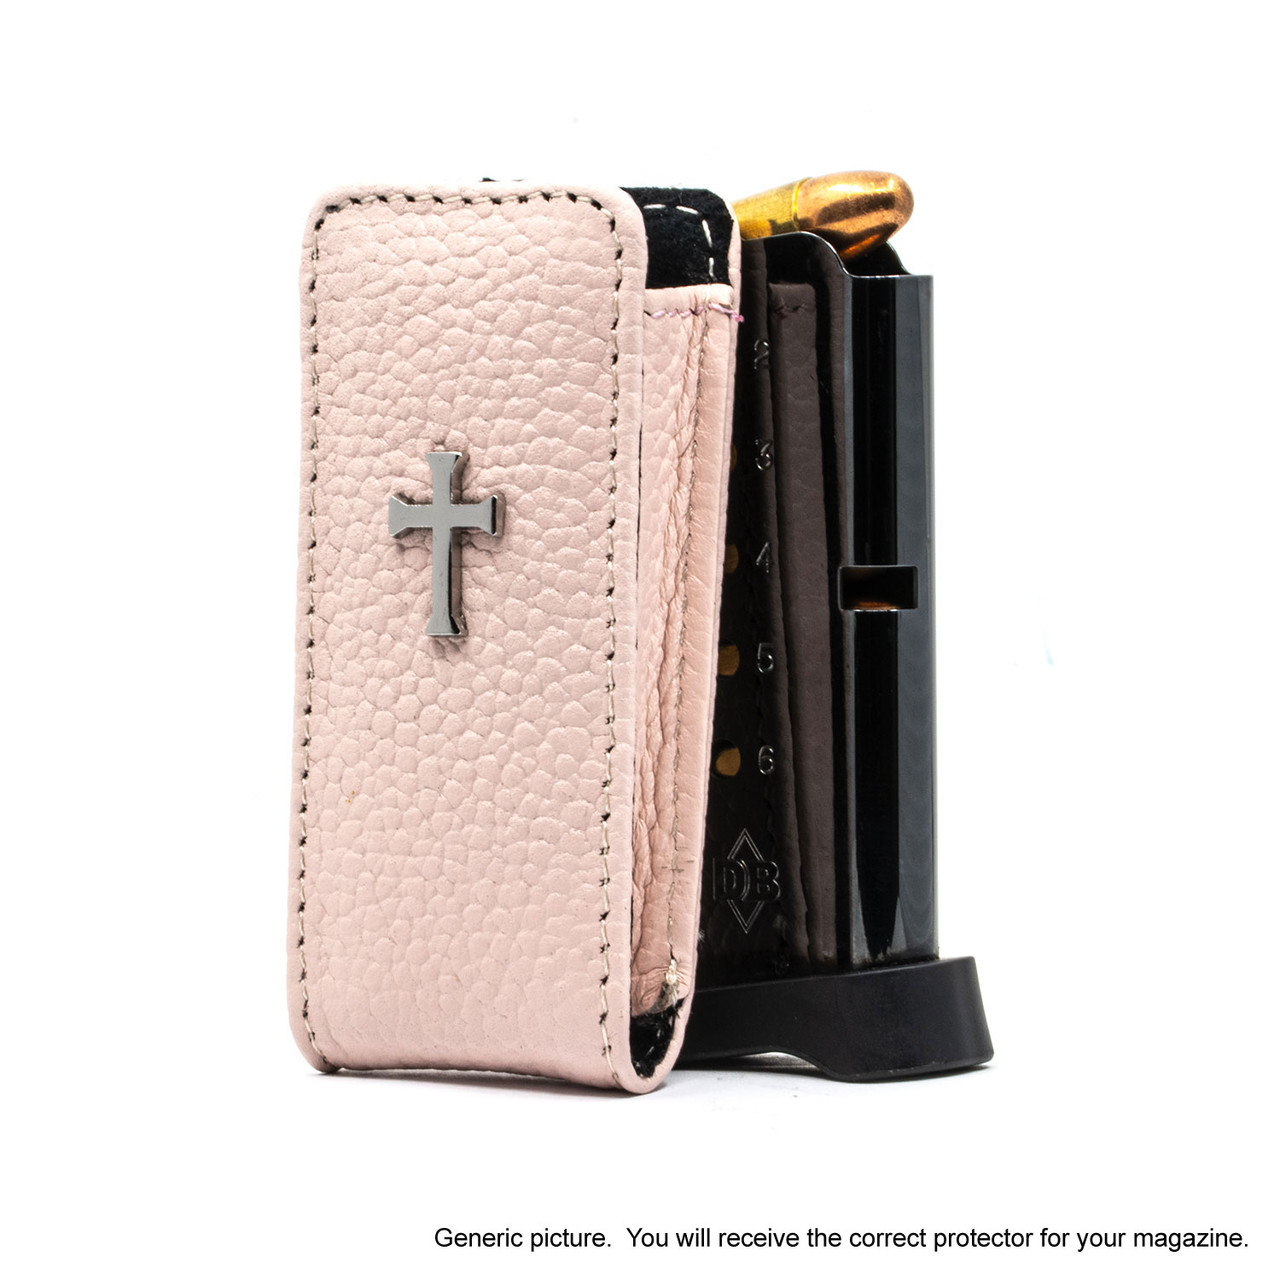 Keltec P11 Pink Carry Faithfully Cross Magazine Pocket Protector